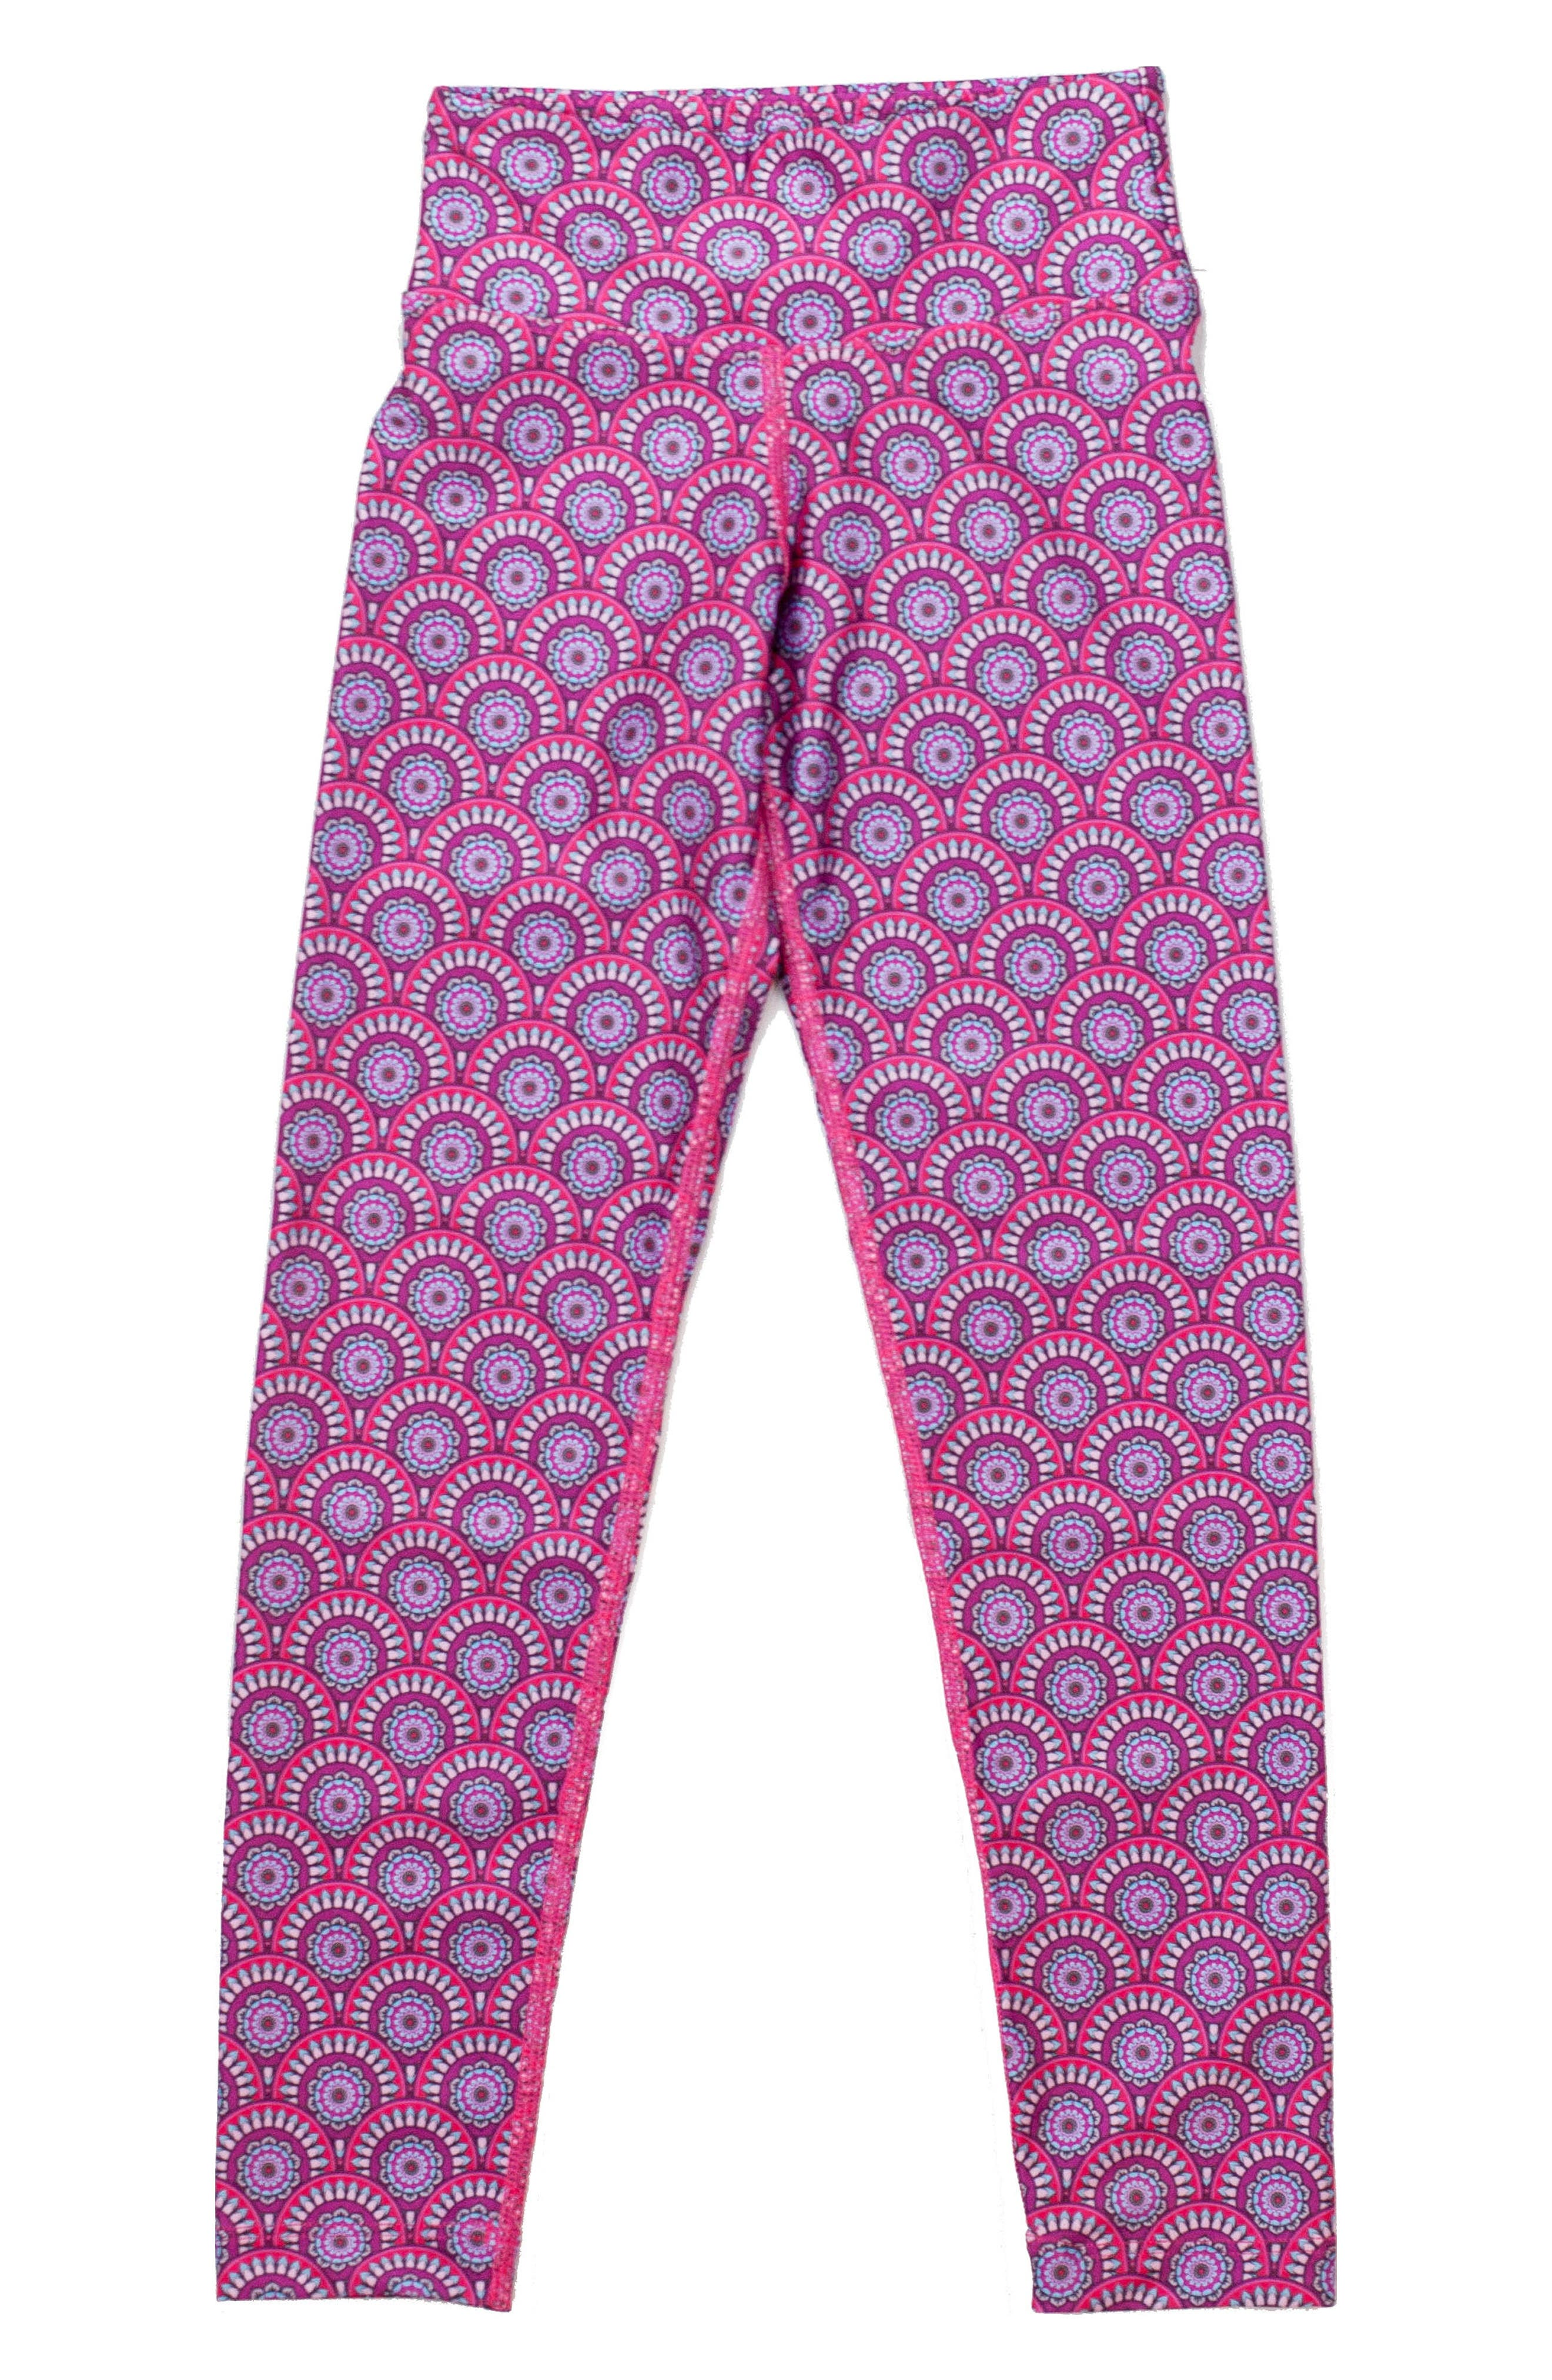 Mandala Leggings,                             Alternate thumbnail 5, color,                             Pink Mandala